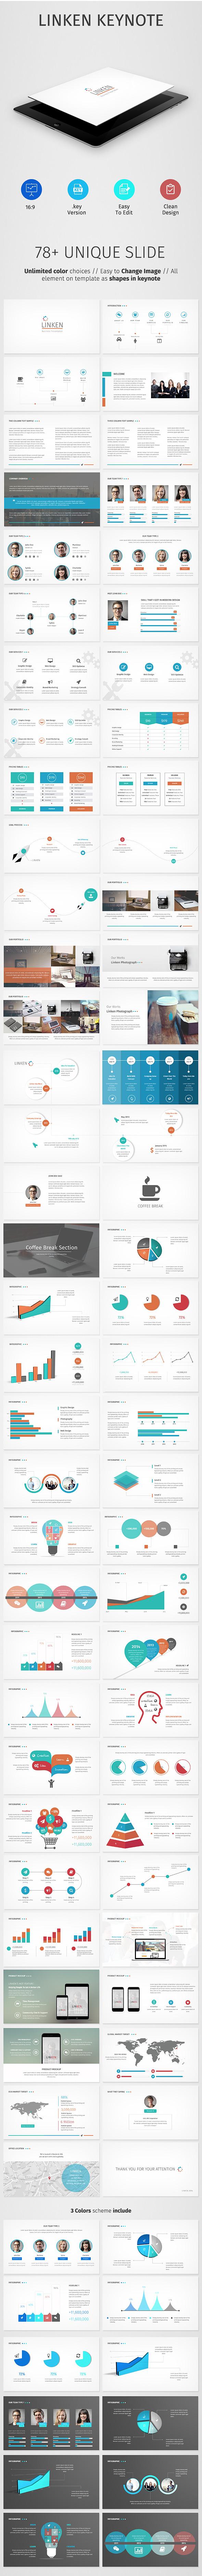 Linken Keynote Presentation - Business Keynote Templates